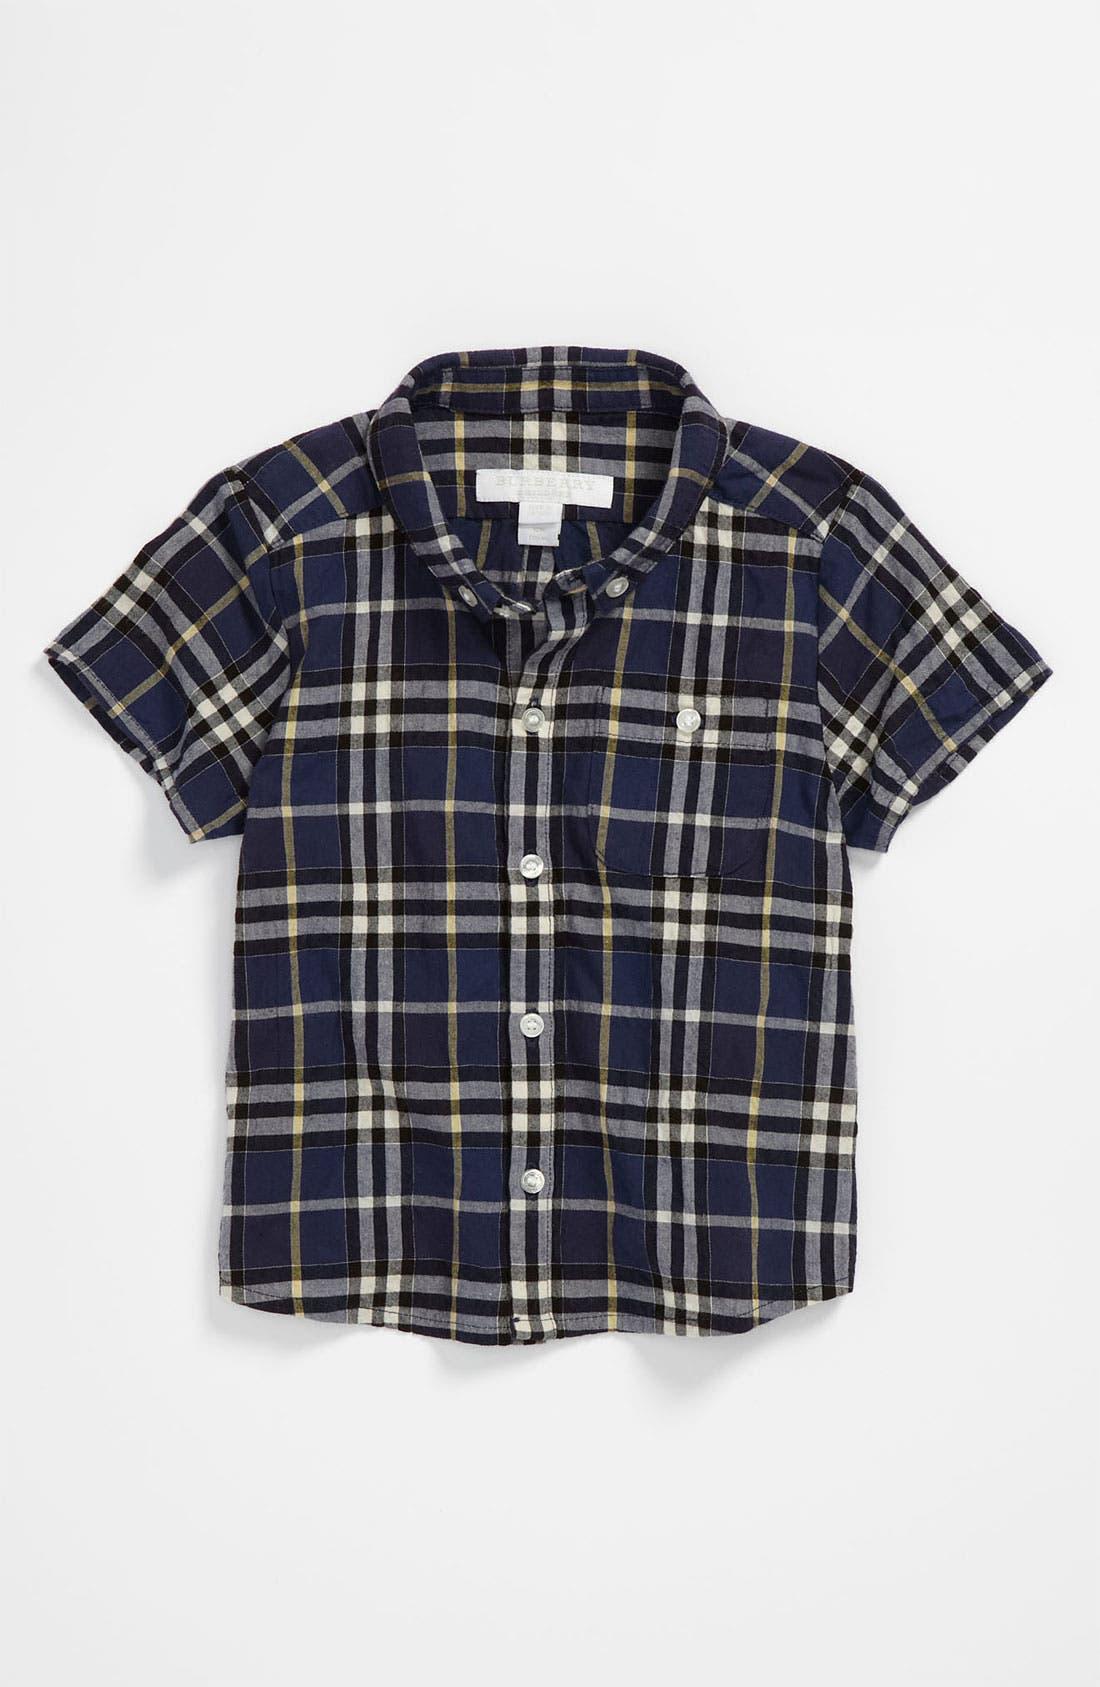 Main Image - Burberry Check Shirt (Toddler)